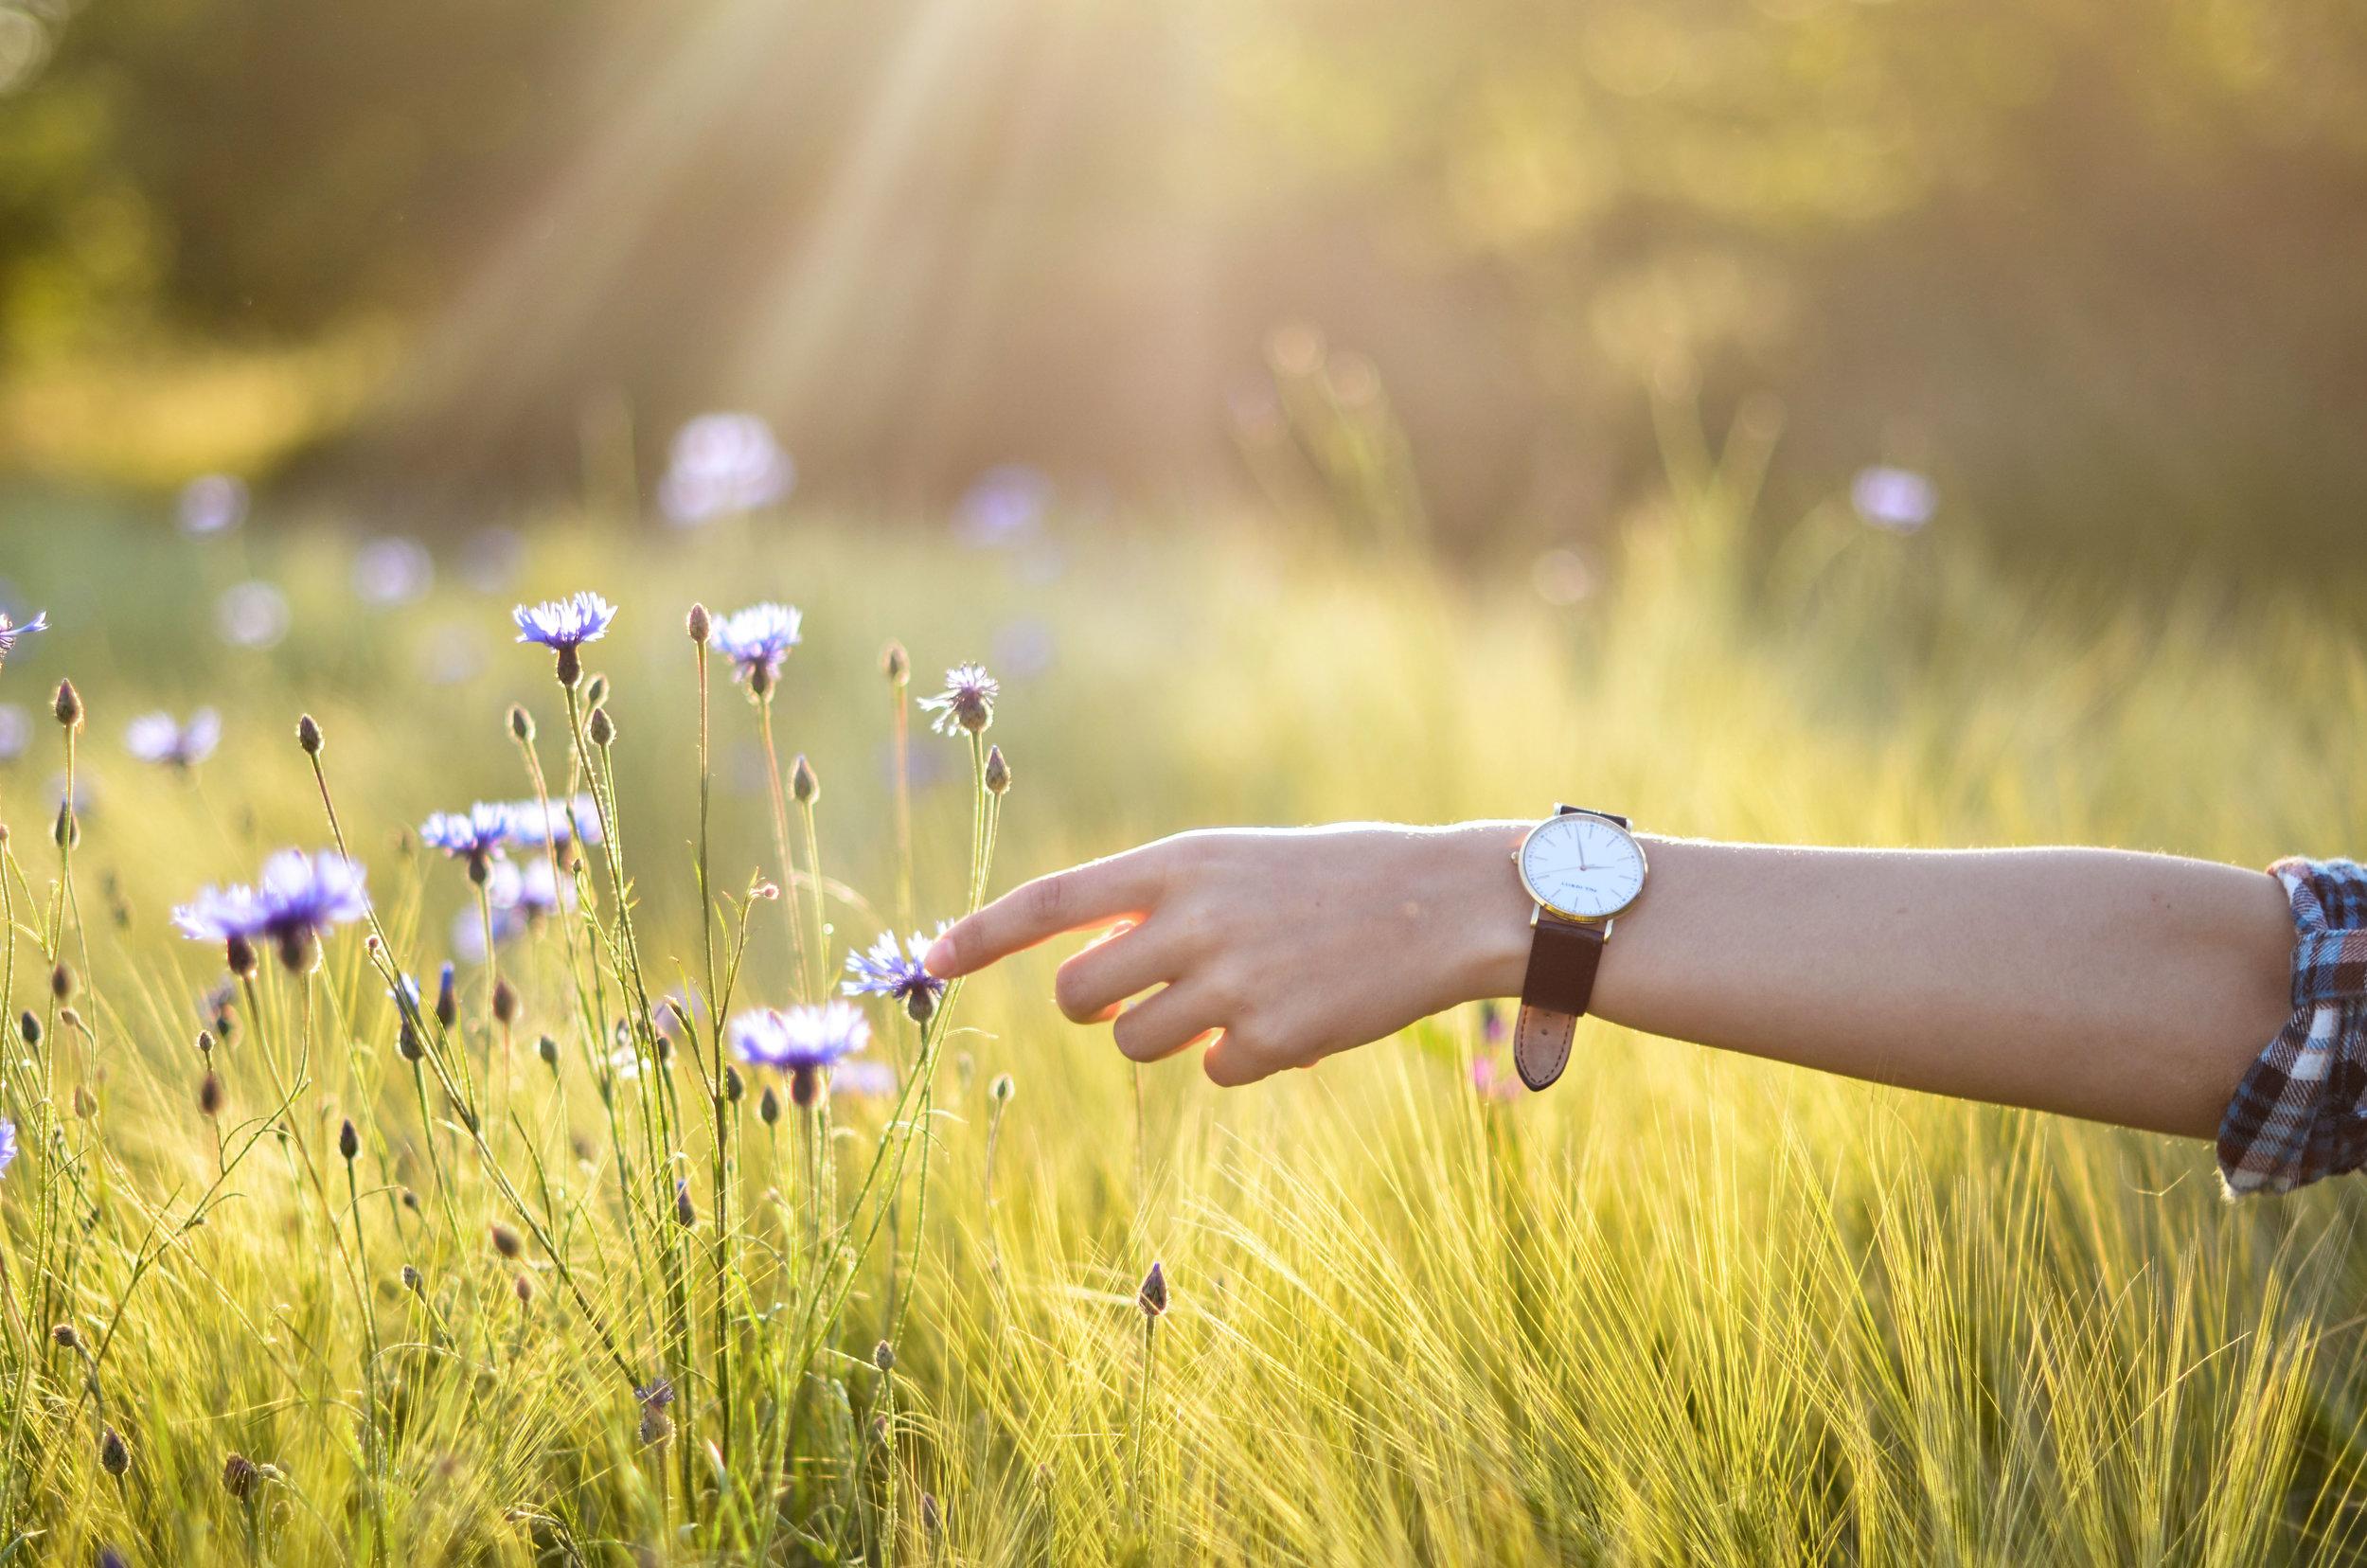 Paul Hewitt - watches, accessory